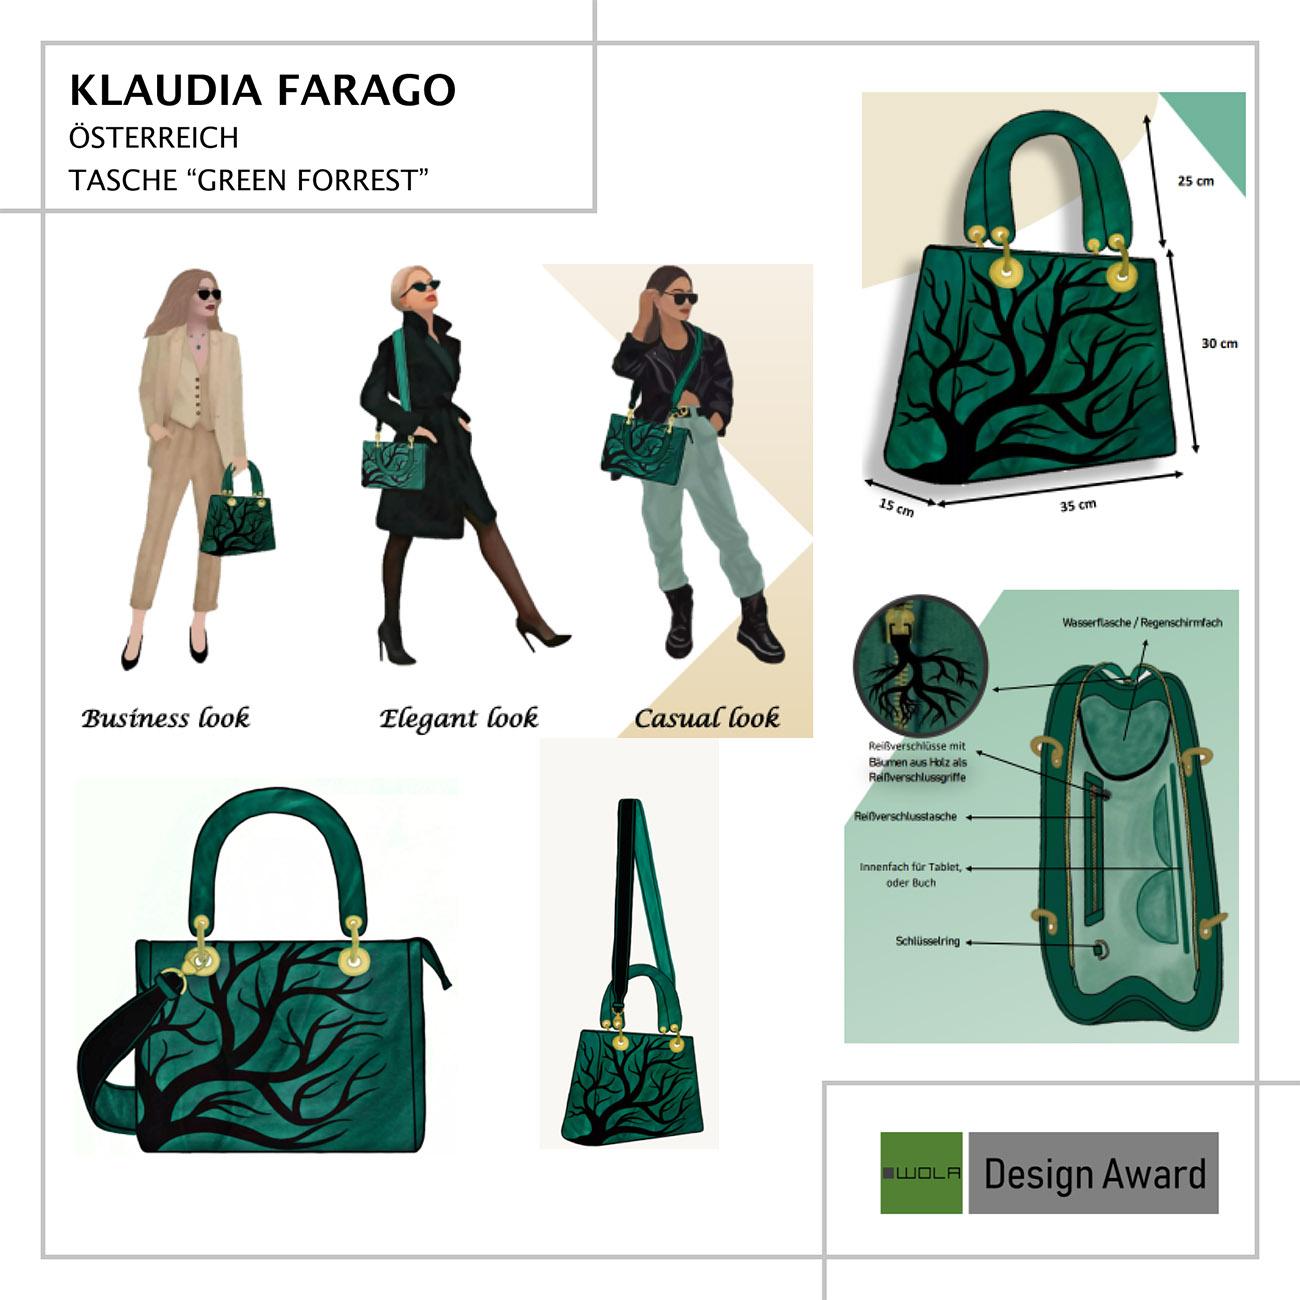 Klaudia Farago WOLA Design Wettbewerb 2021  -1